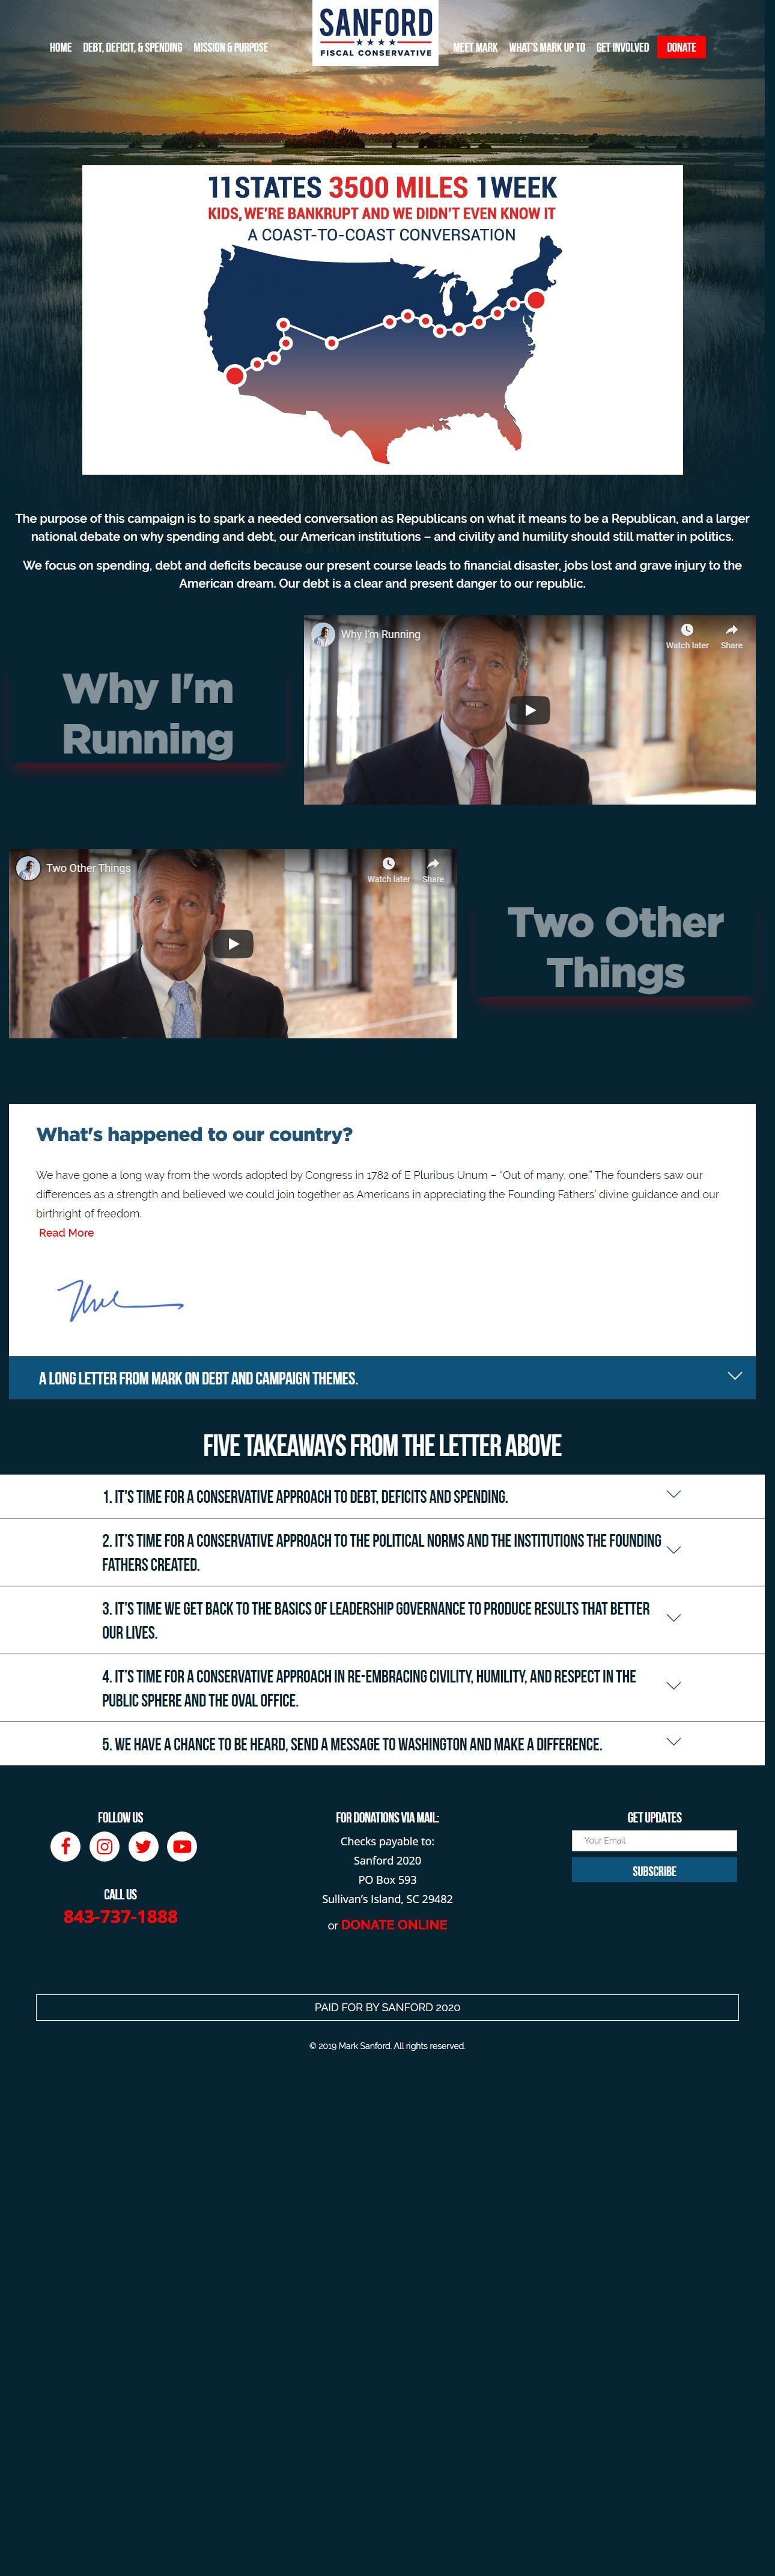 Homepage Snapshot for November 1, 2019: Former Governor Mark Sanford